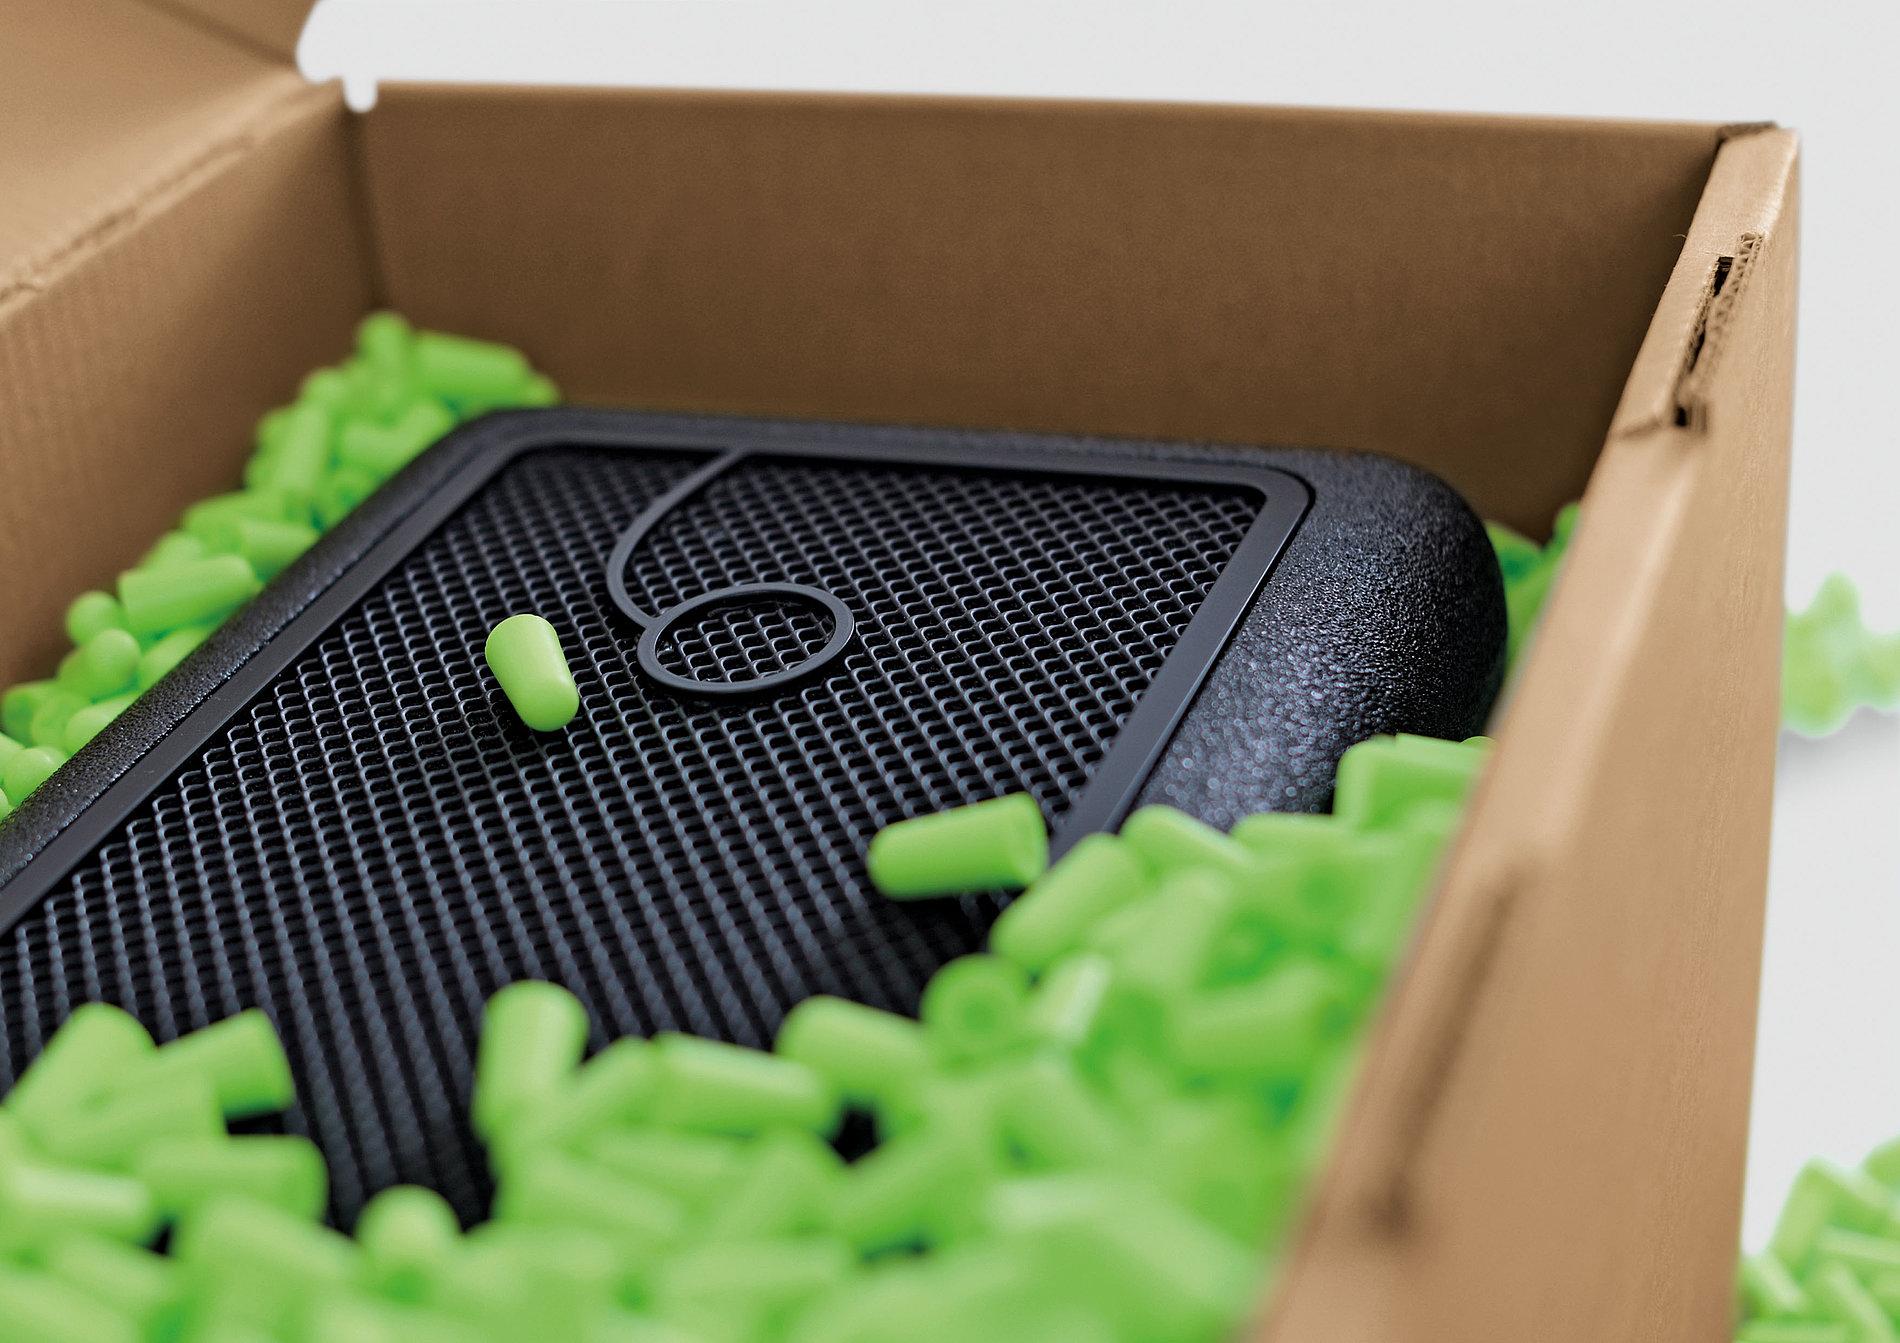 The Earplug Packaging | Red Dot Design Award